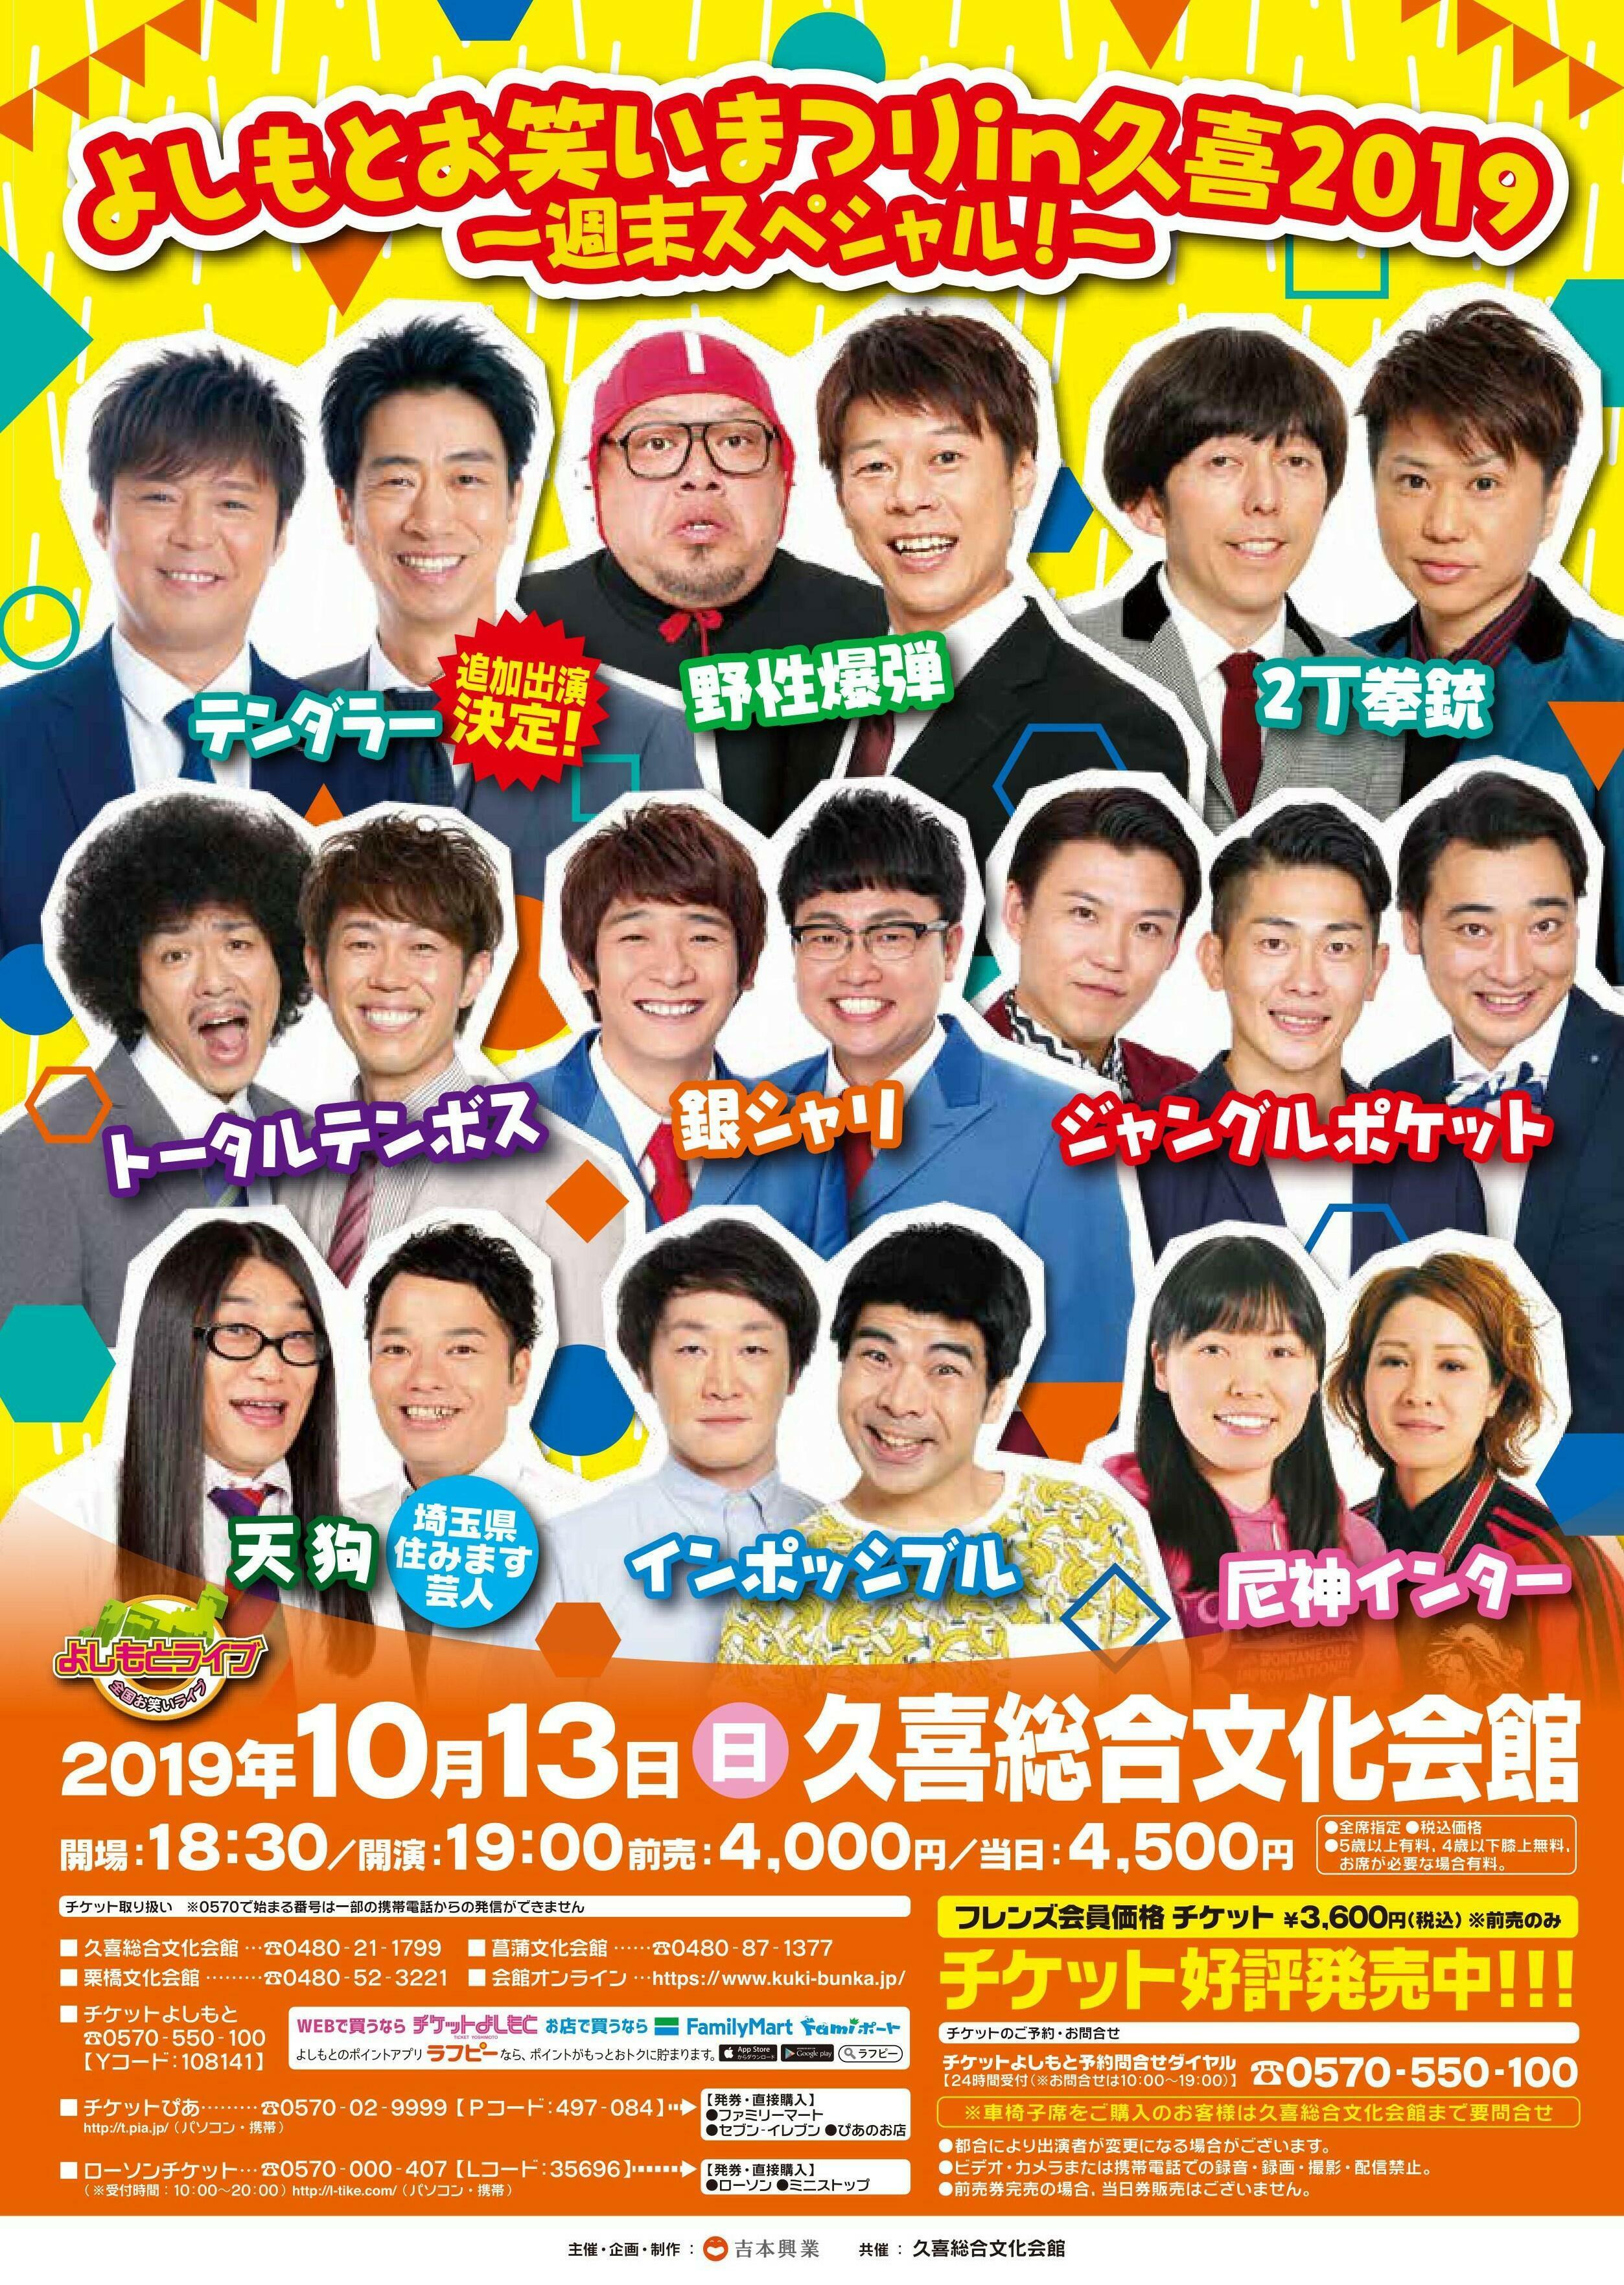 http://www.syumatsu.jp/20190903145317-4c3020264b0a6e009e7e5b8574d767812bdcb3c0.jpg